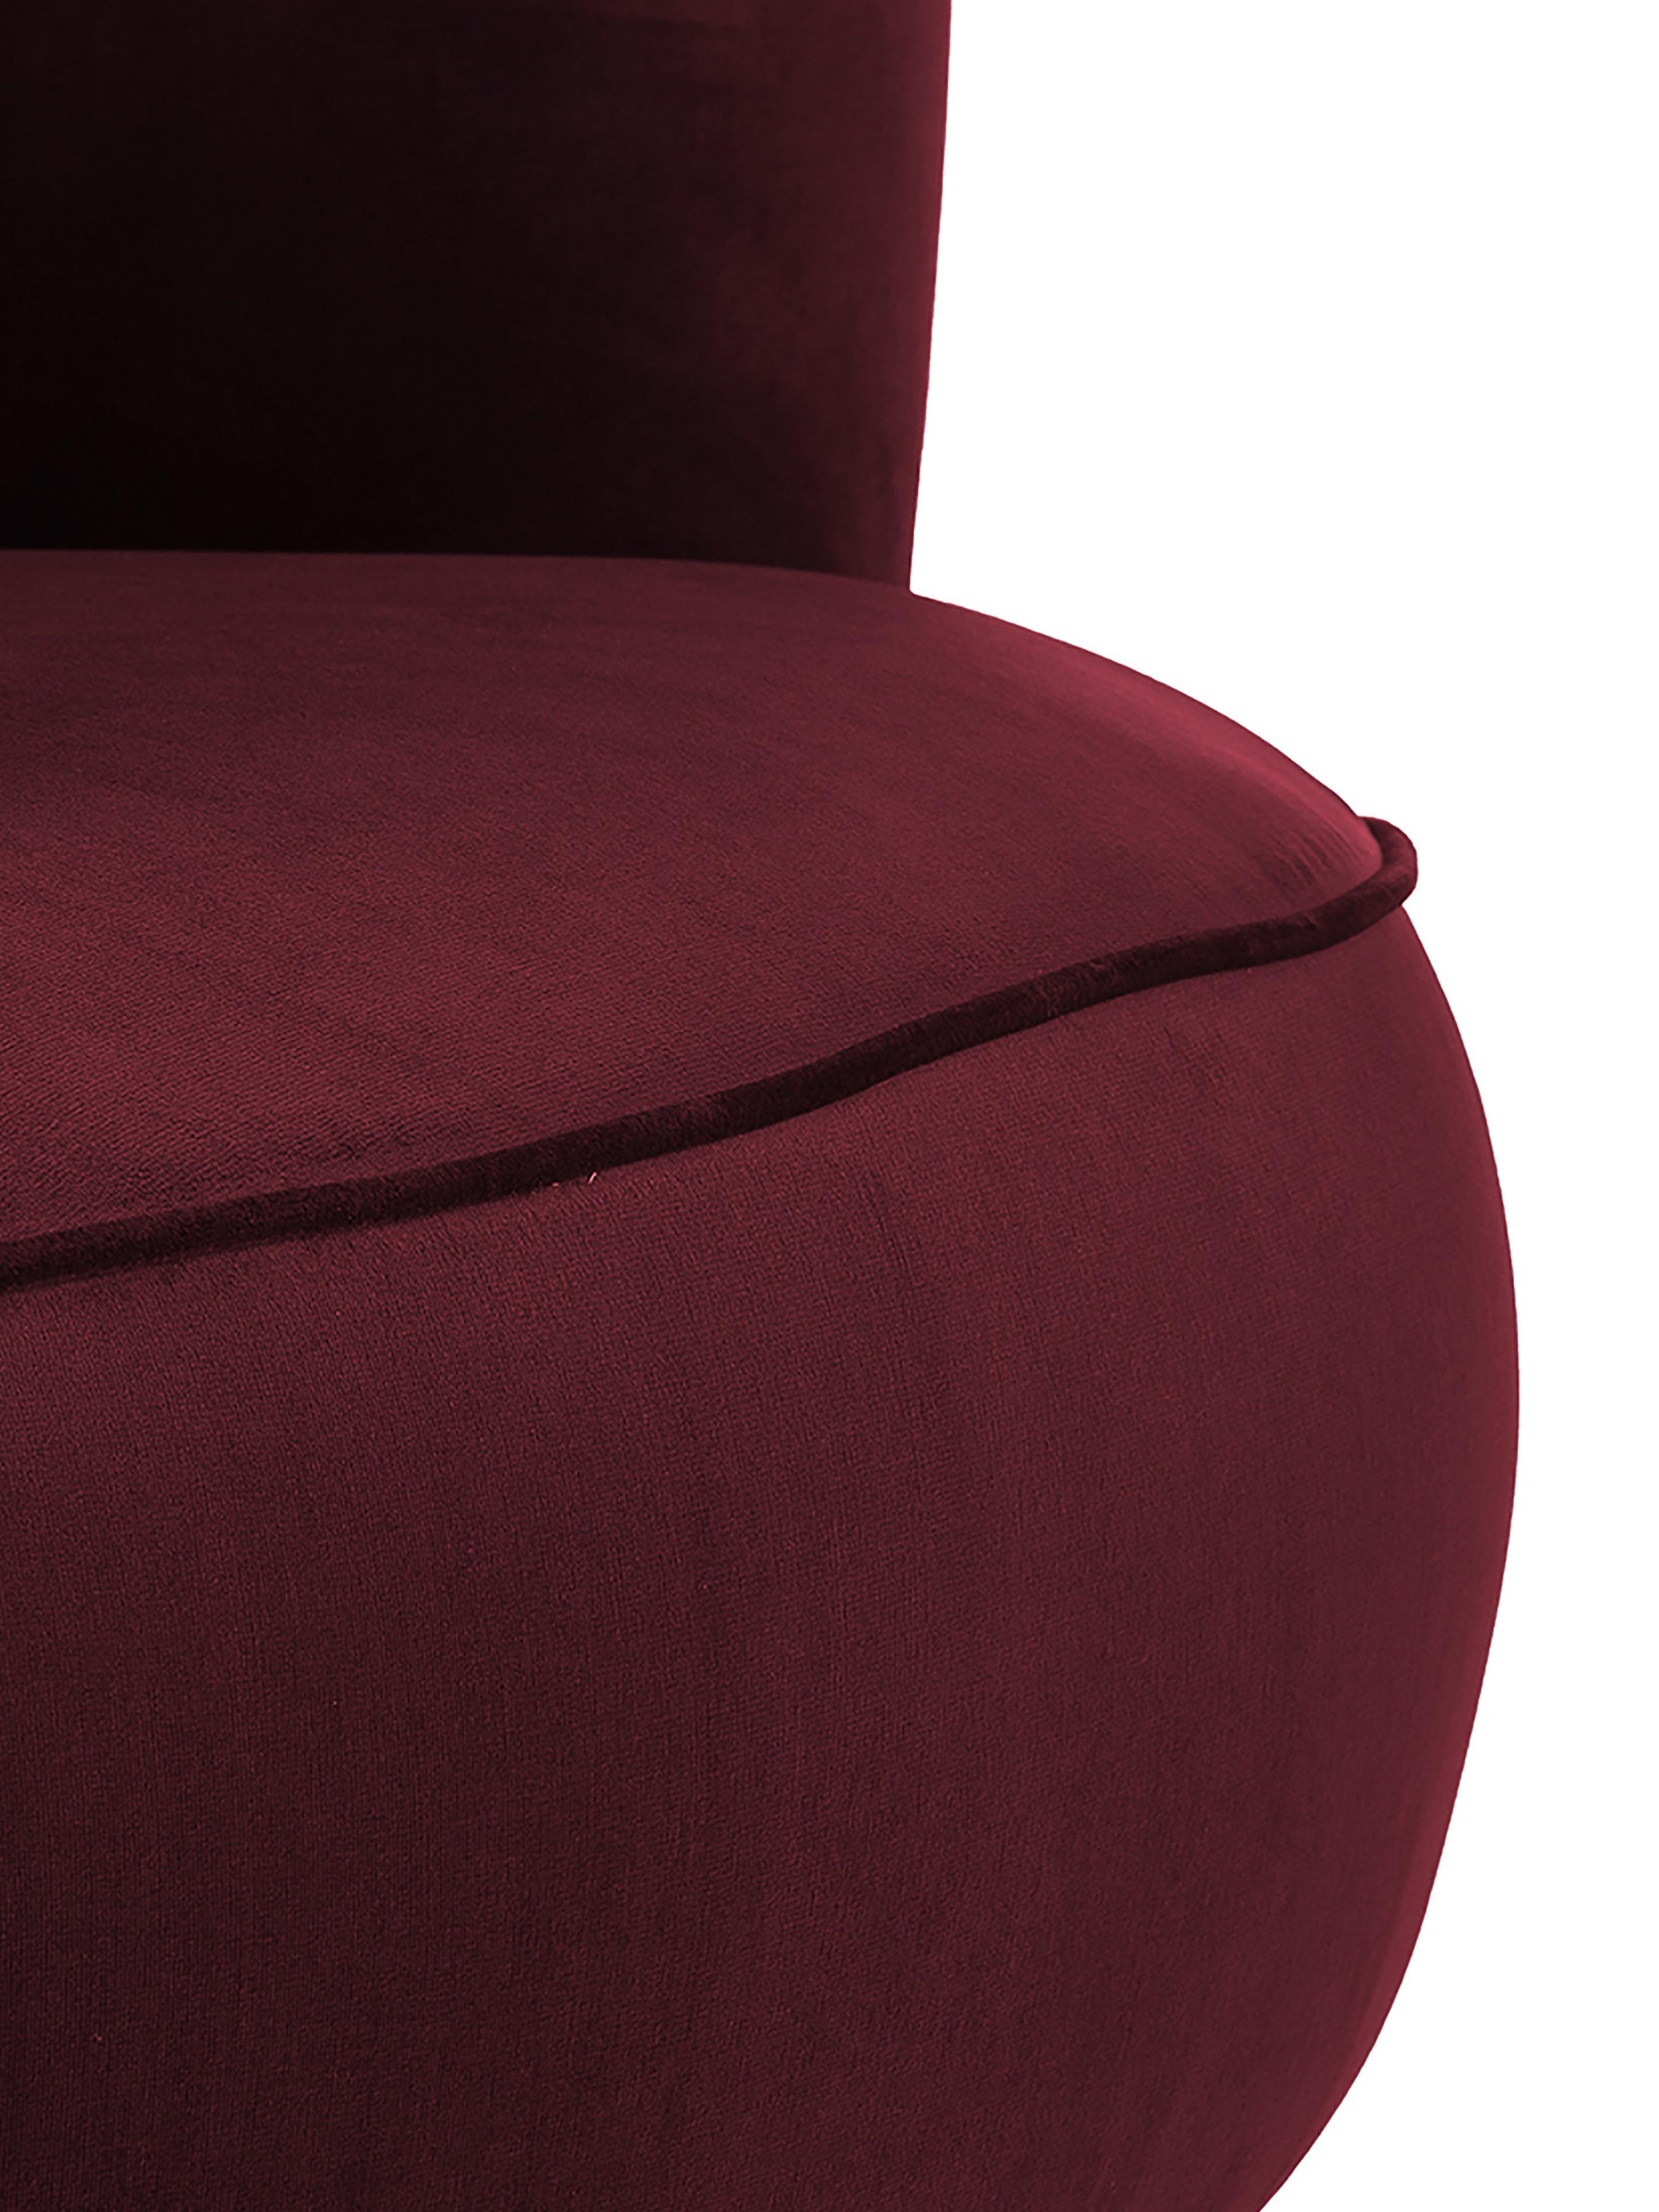 Samt-Cocktailsessel Ella in Rot, Bezug: Samt (Polyester) 50.000 S, Füße: Metall, lackiert, Samt Dunkelrot, B 74 x T 78 cm